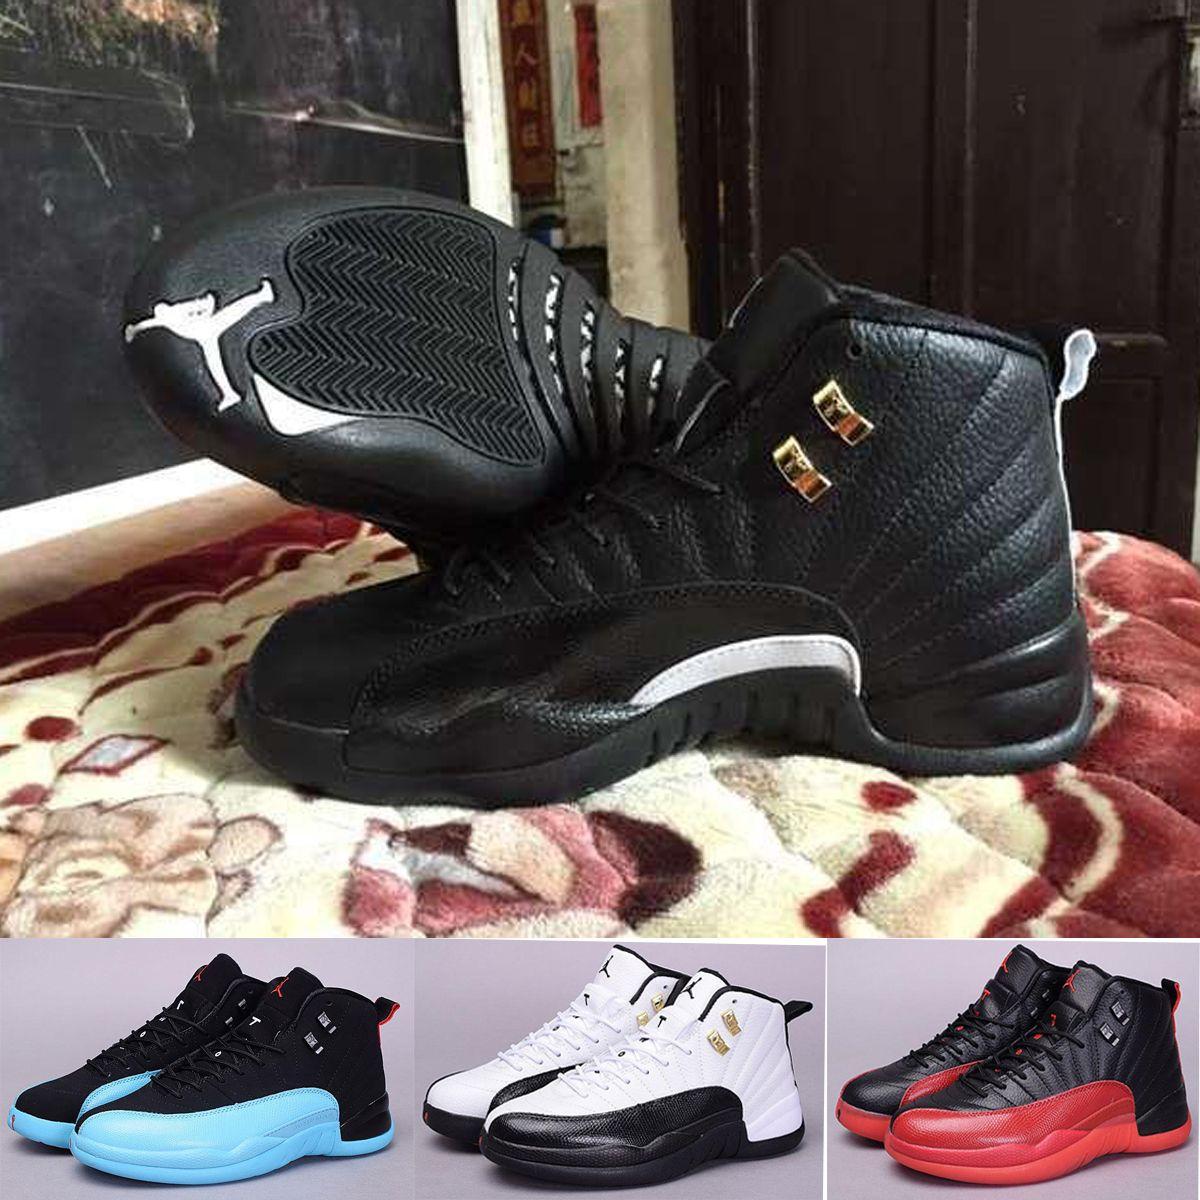 the latest ecb7f 48fee air jordan retro 12 women shoes black blue | Peninsula ...